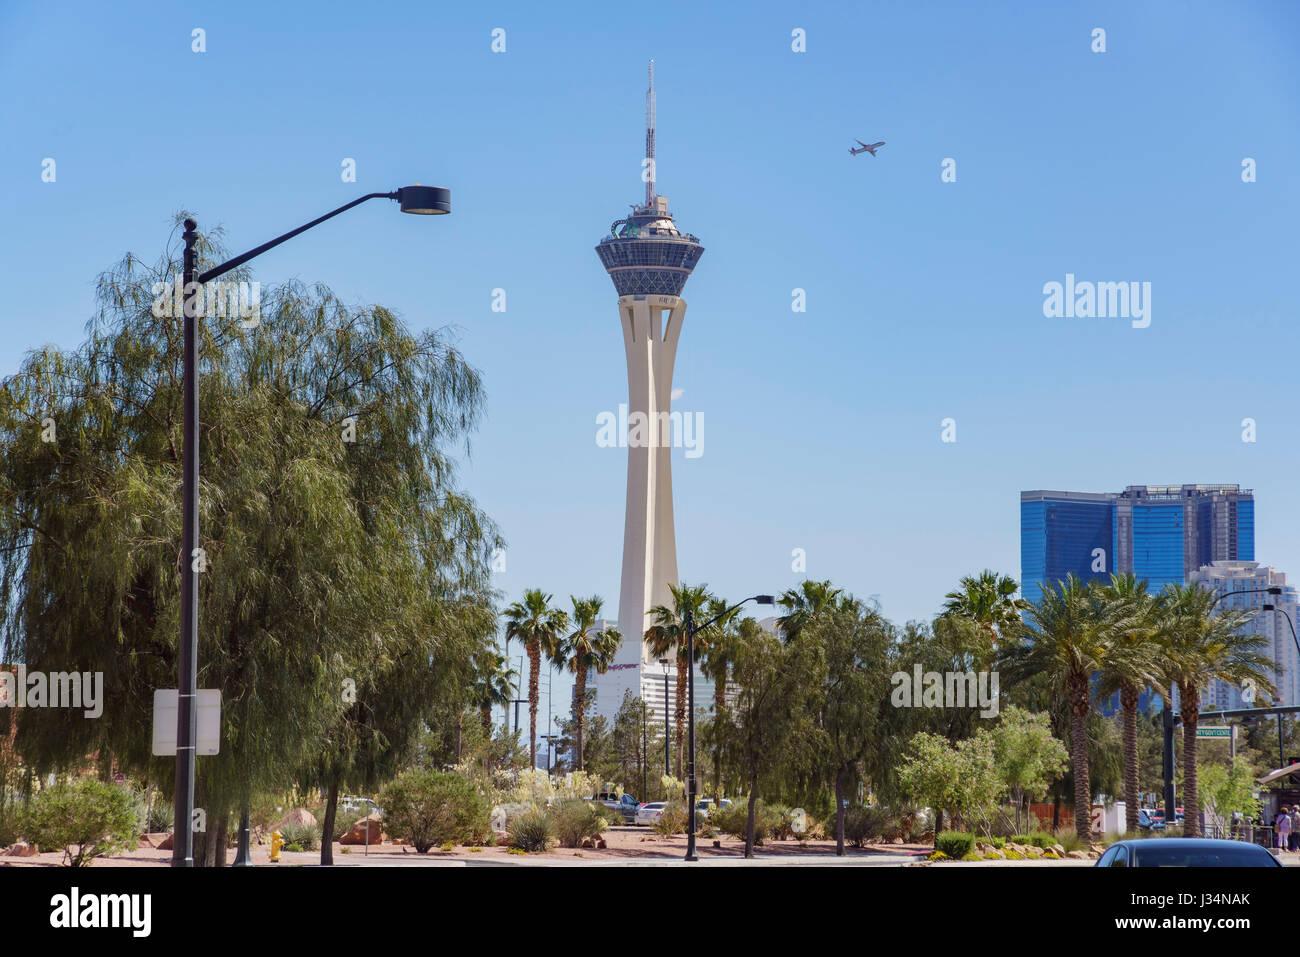 Las Vegas, APR 29: Morning view of Stratosphere Casino, Hotel & Tower on APR 29, 2017 at Las Vegas, Nevada - Stock Image